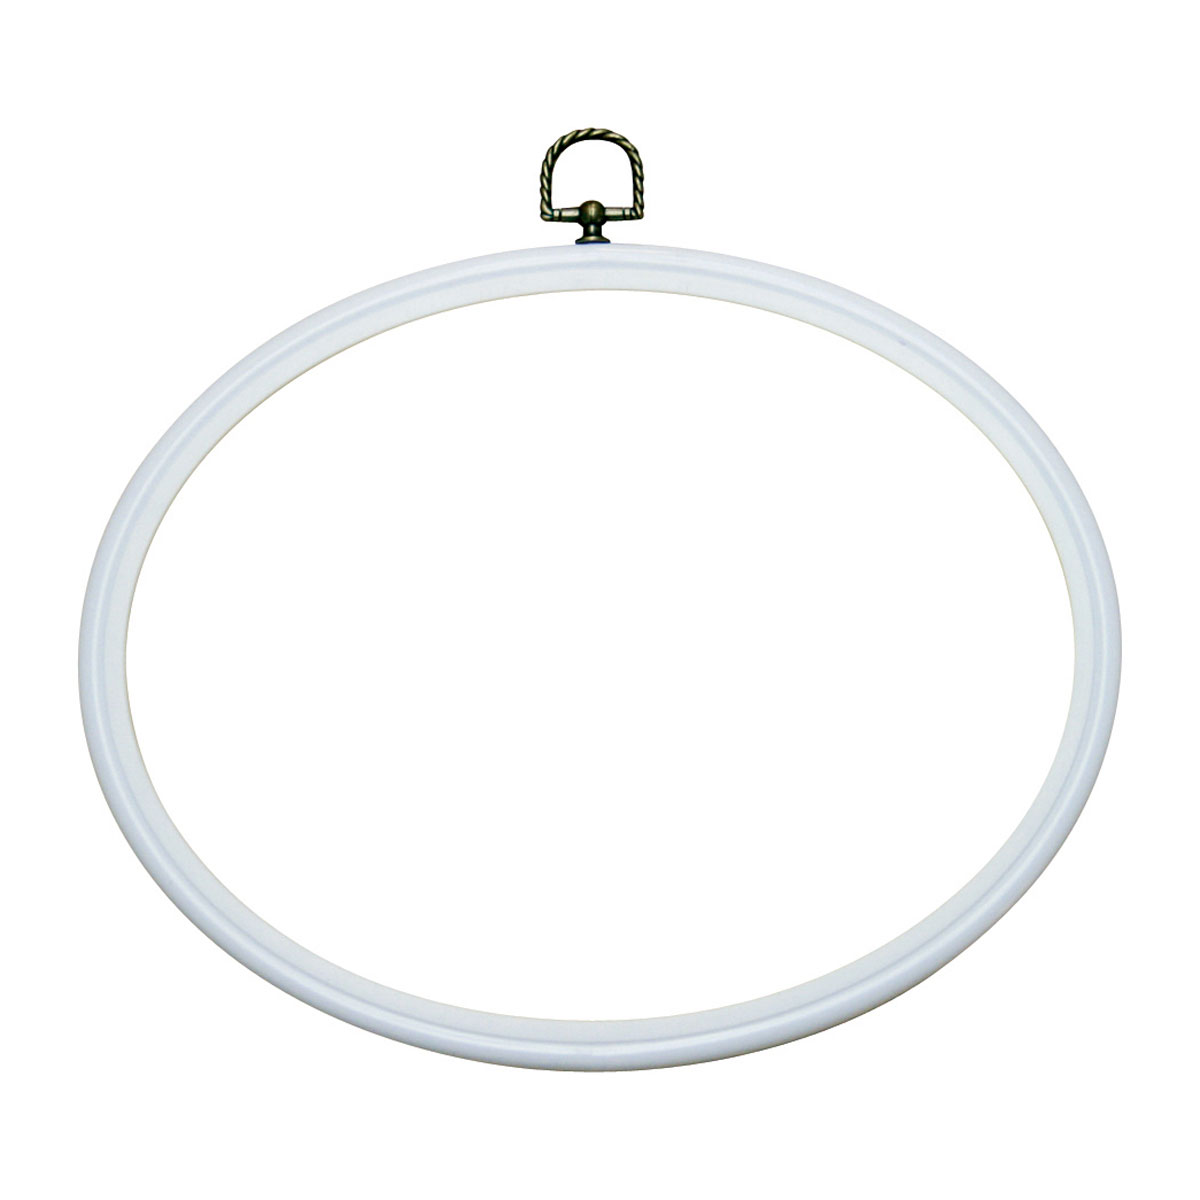 Plastic Oval Frame to Display Needlecraft Pieces | White | 20 x 25cm ...